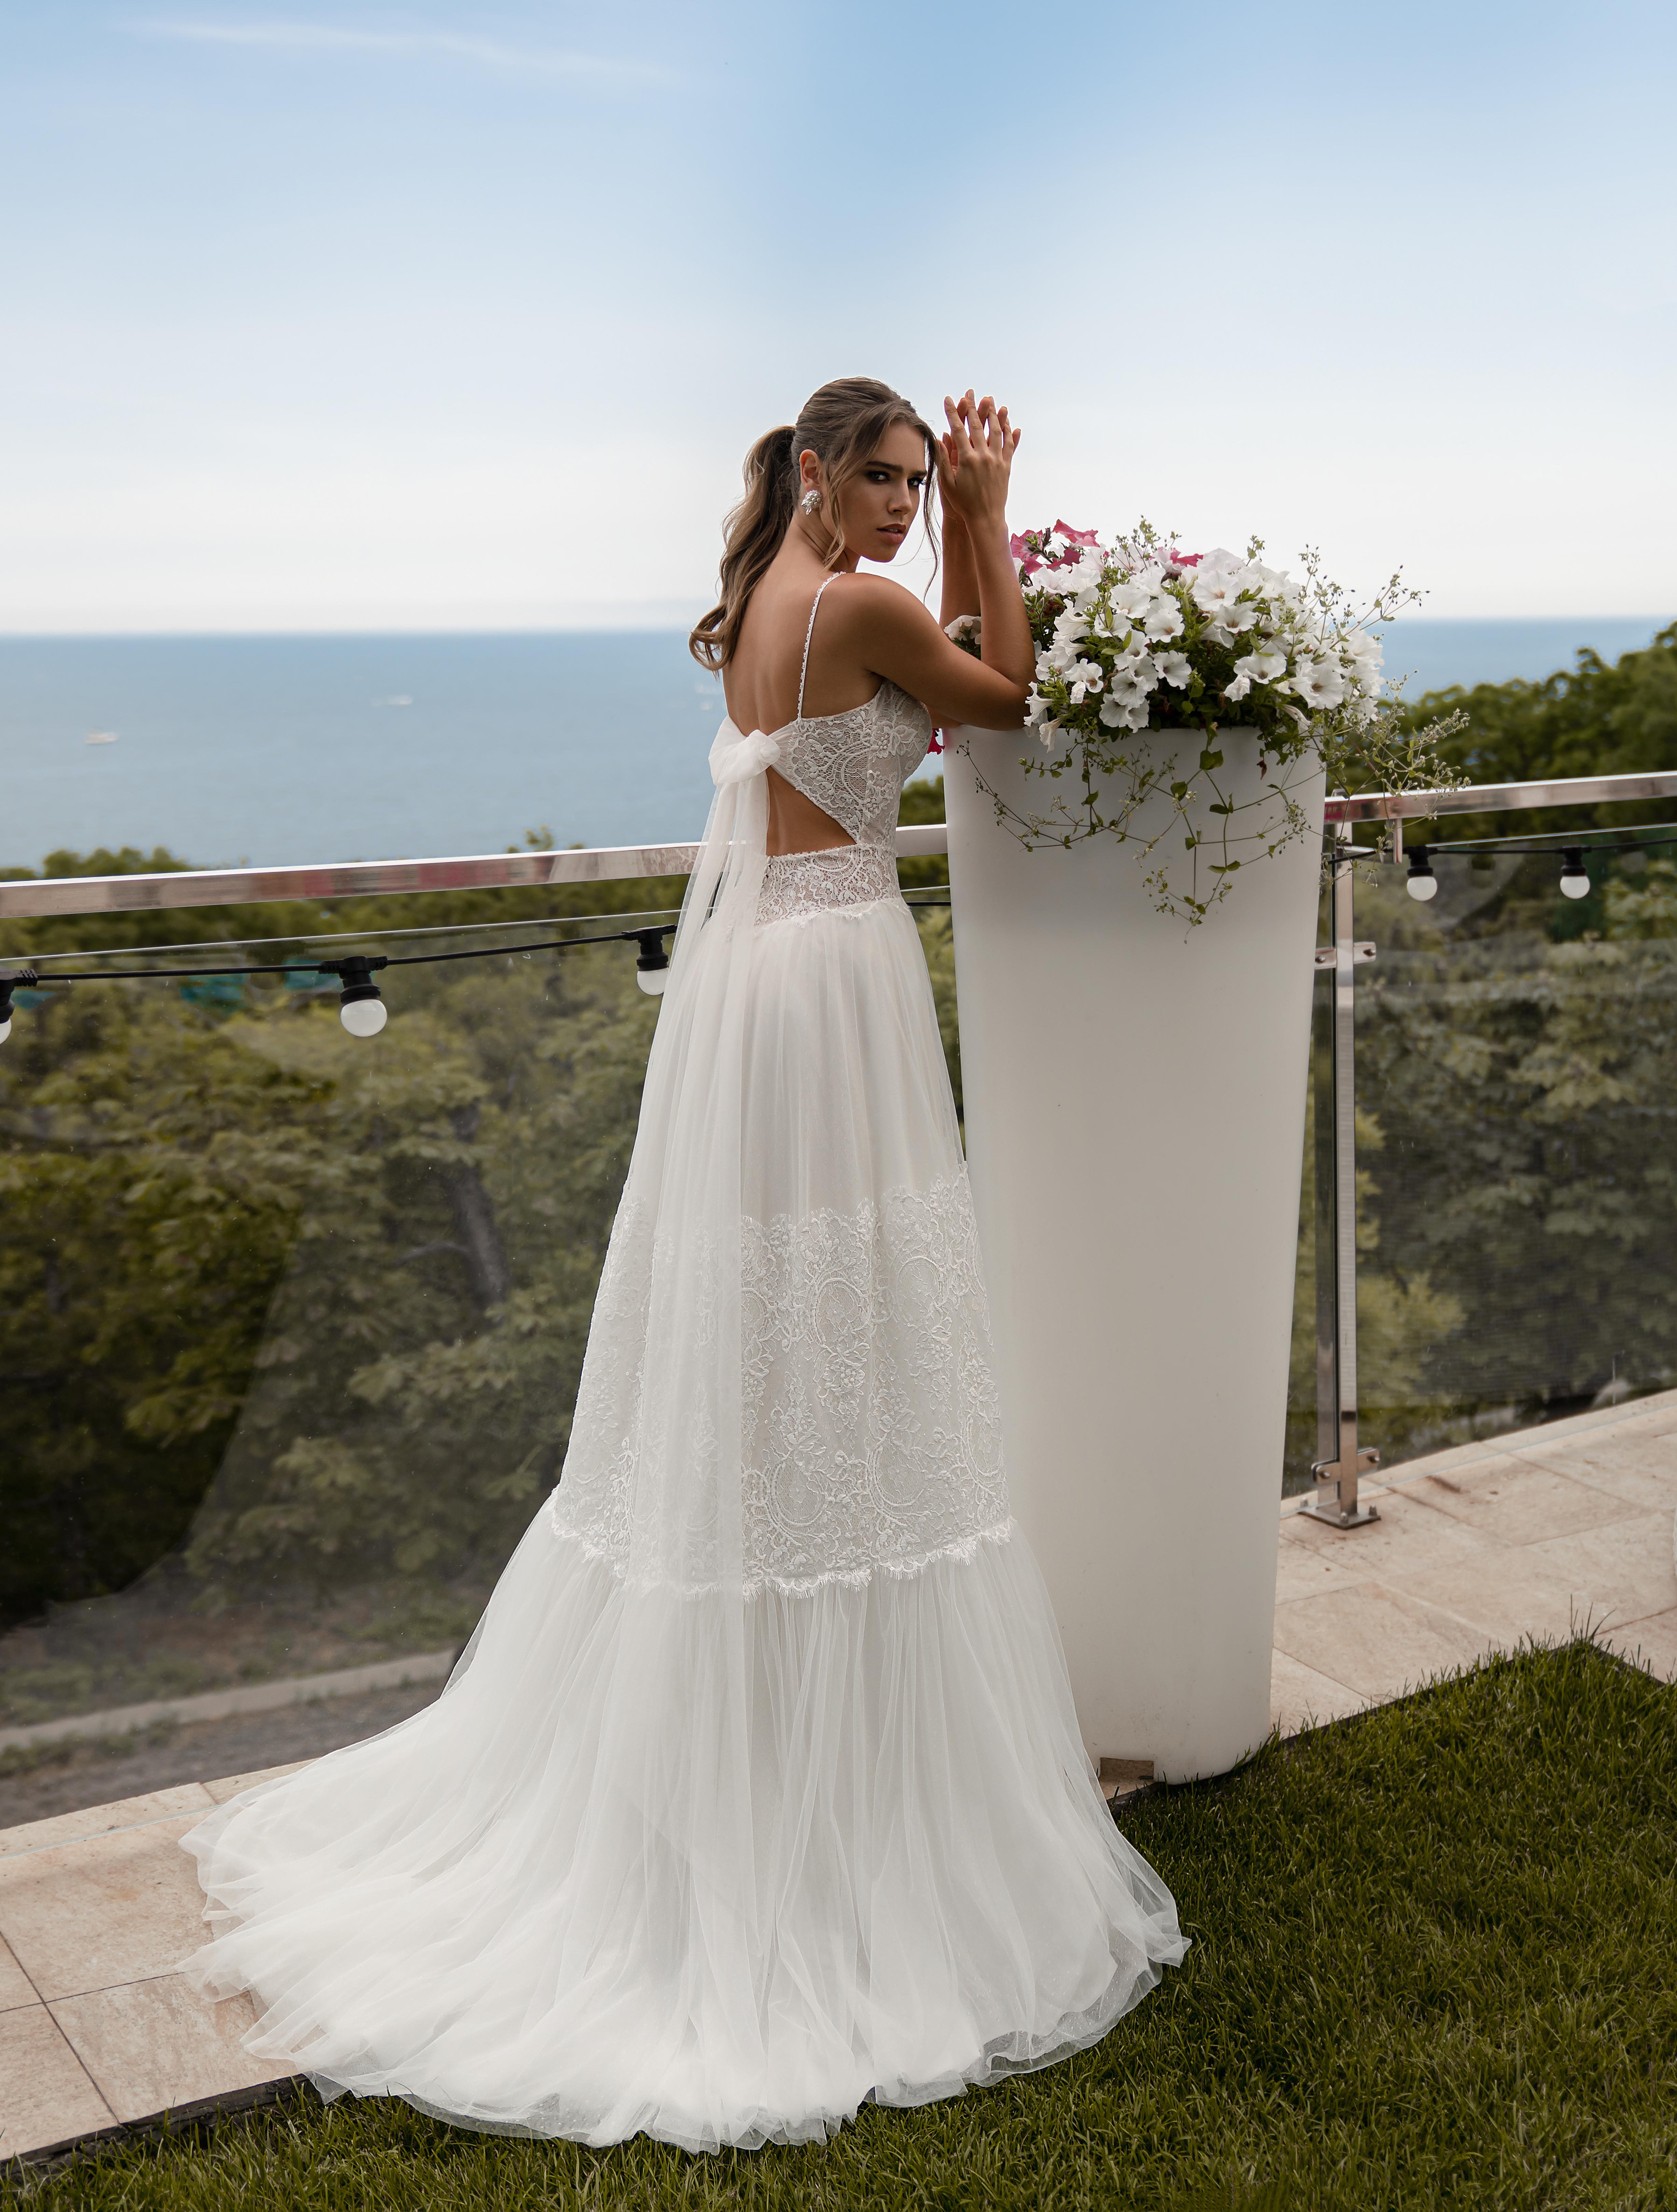 Свадебно платье в стиле бохо от Supernova-1